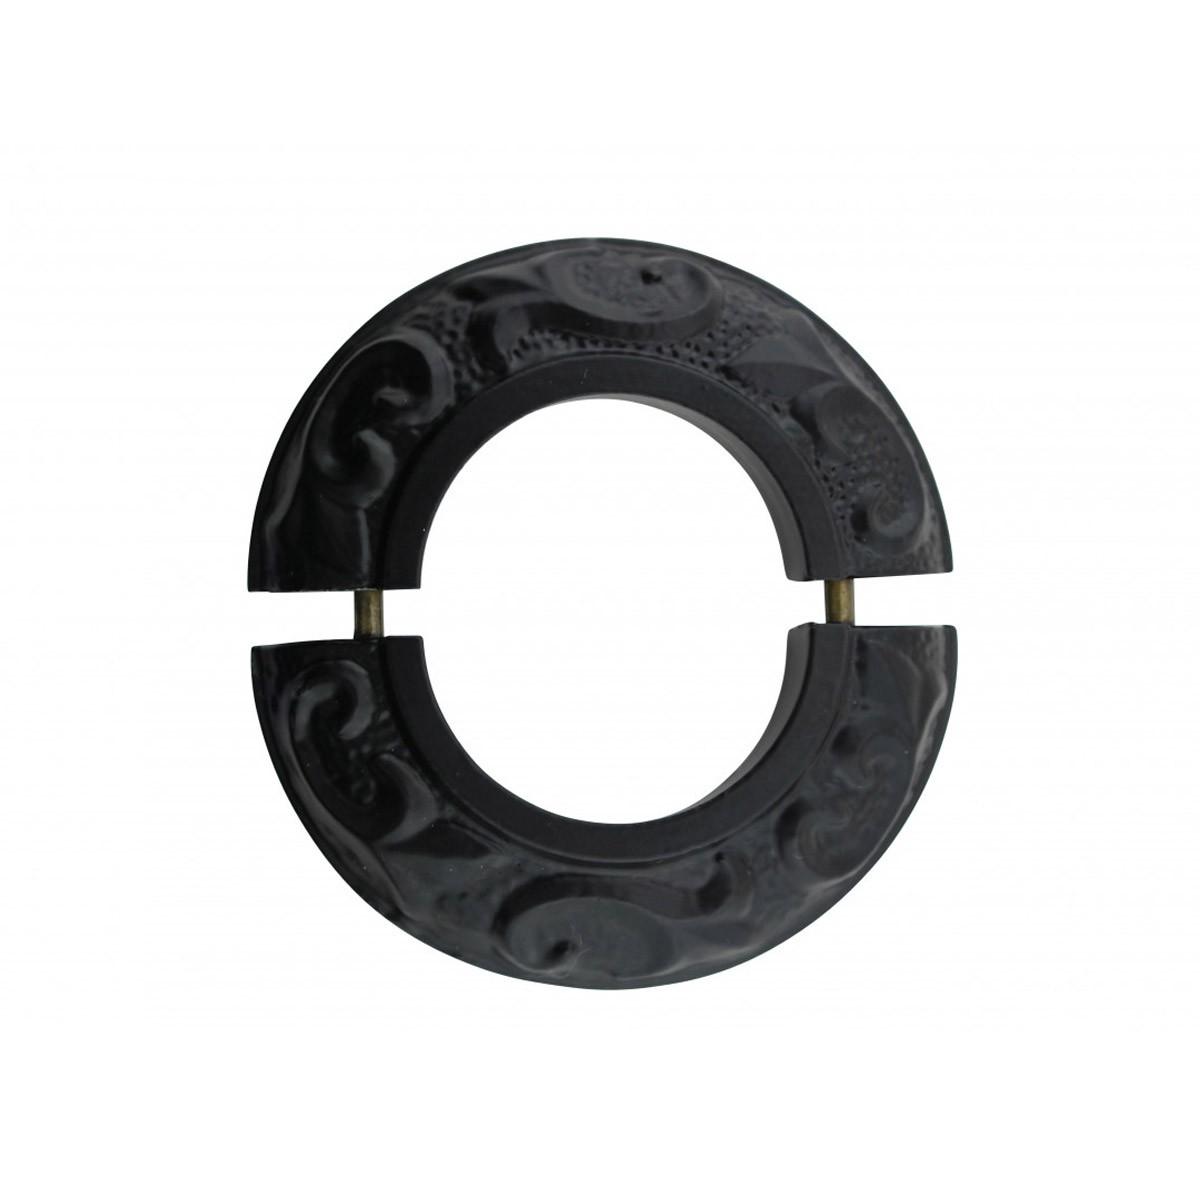 6 Radiator Flanges Fleur De Lis Black Aluminum Radiator Flanges Radiator Flange Radiator Pipe Collar